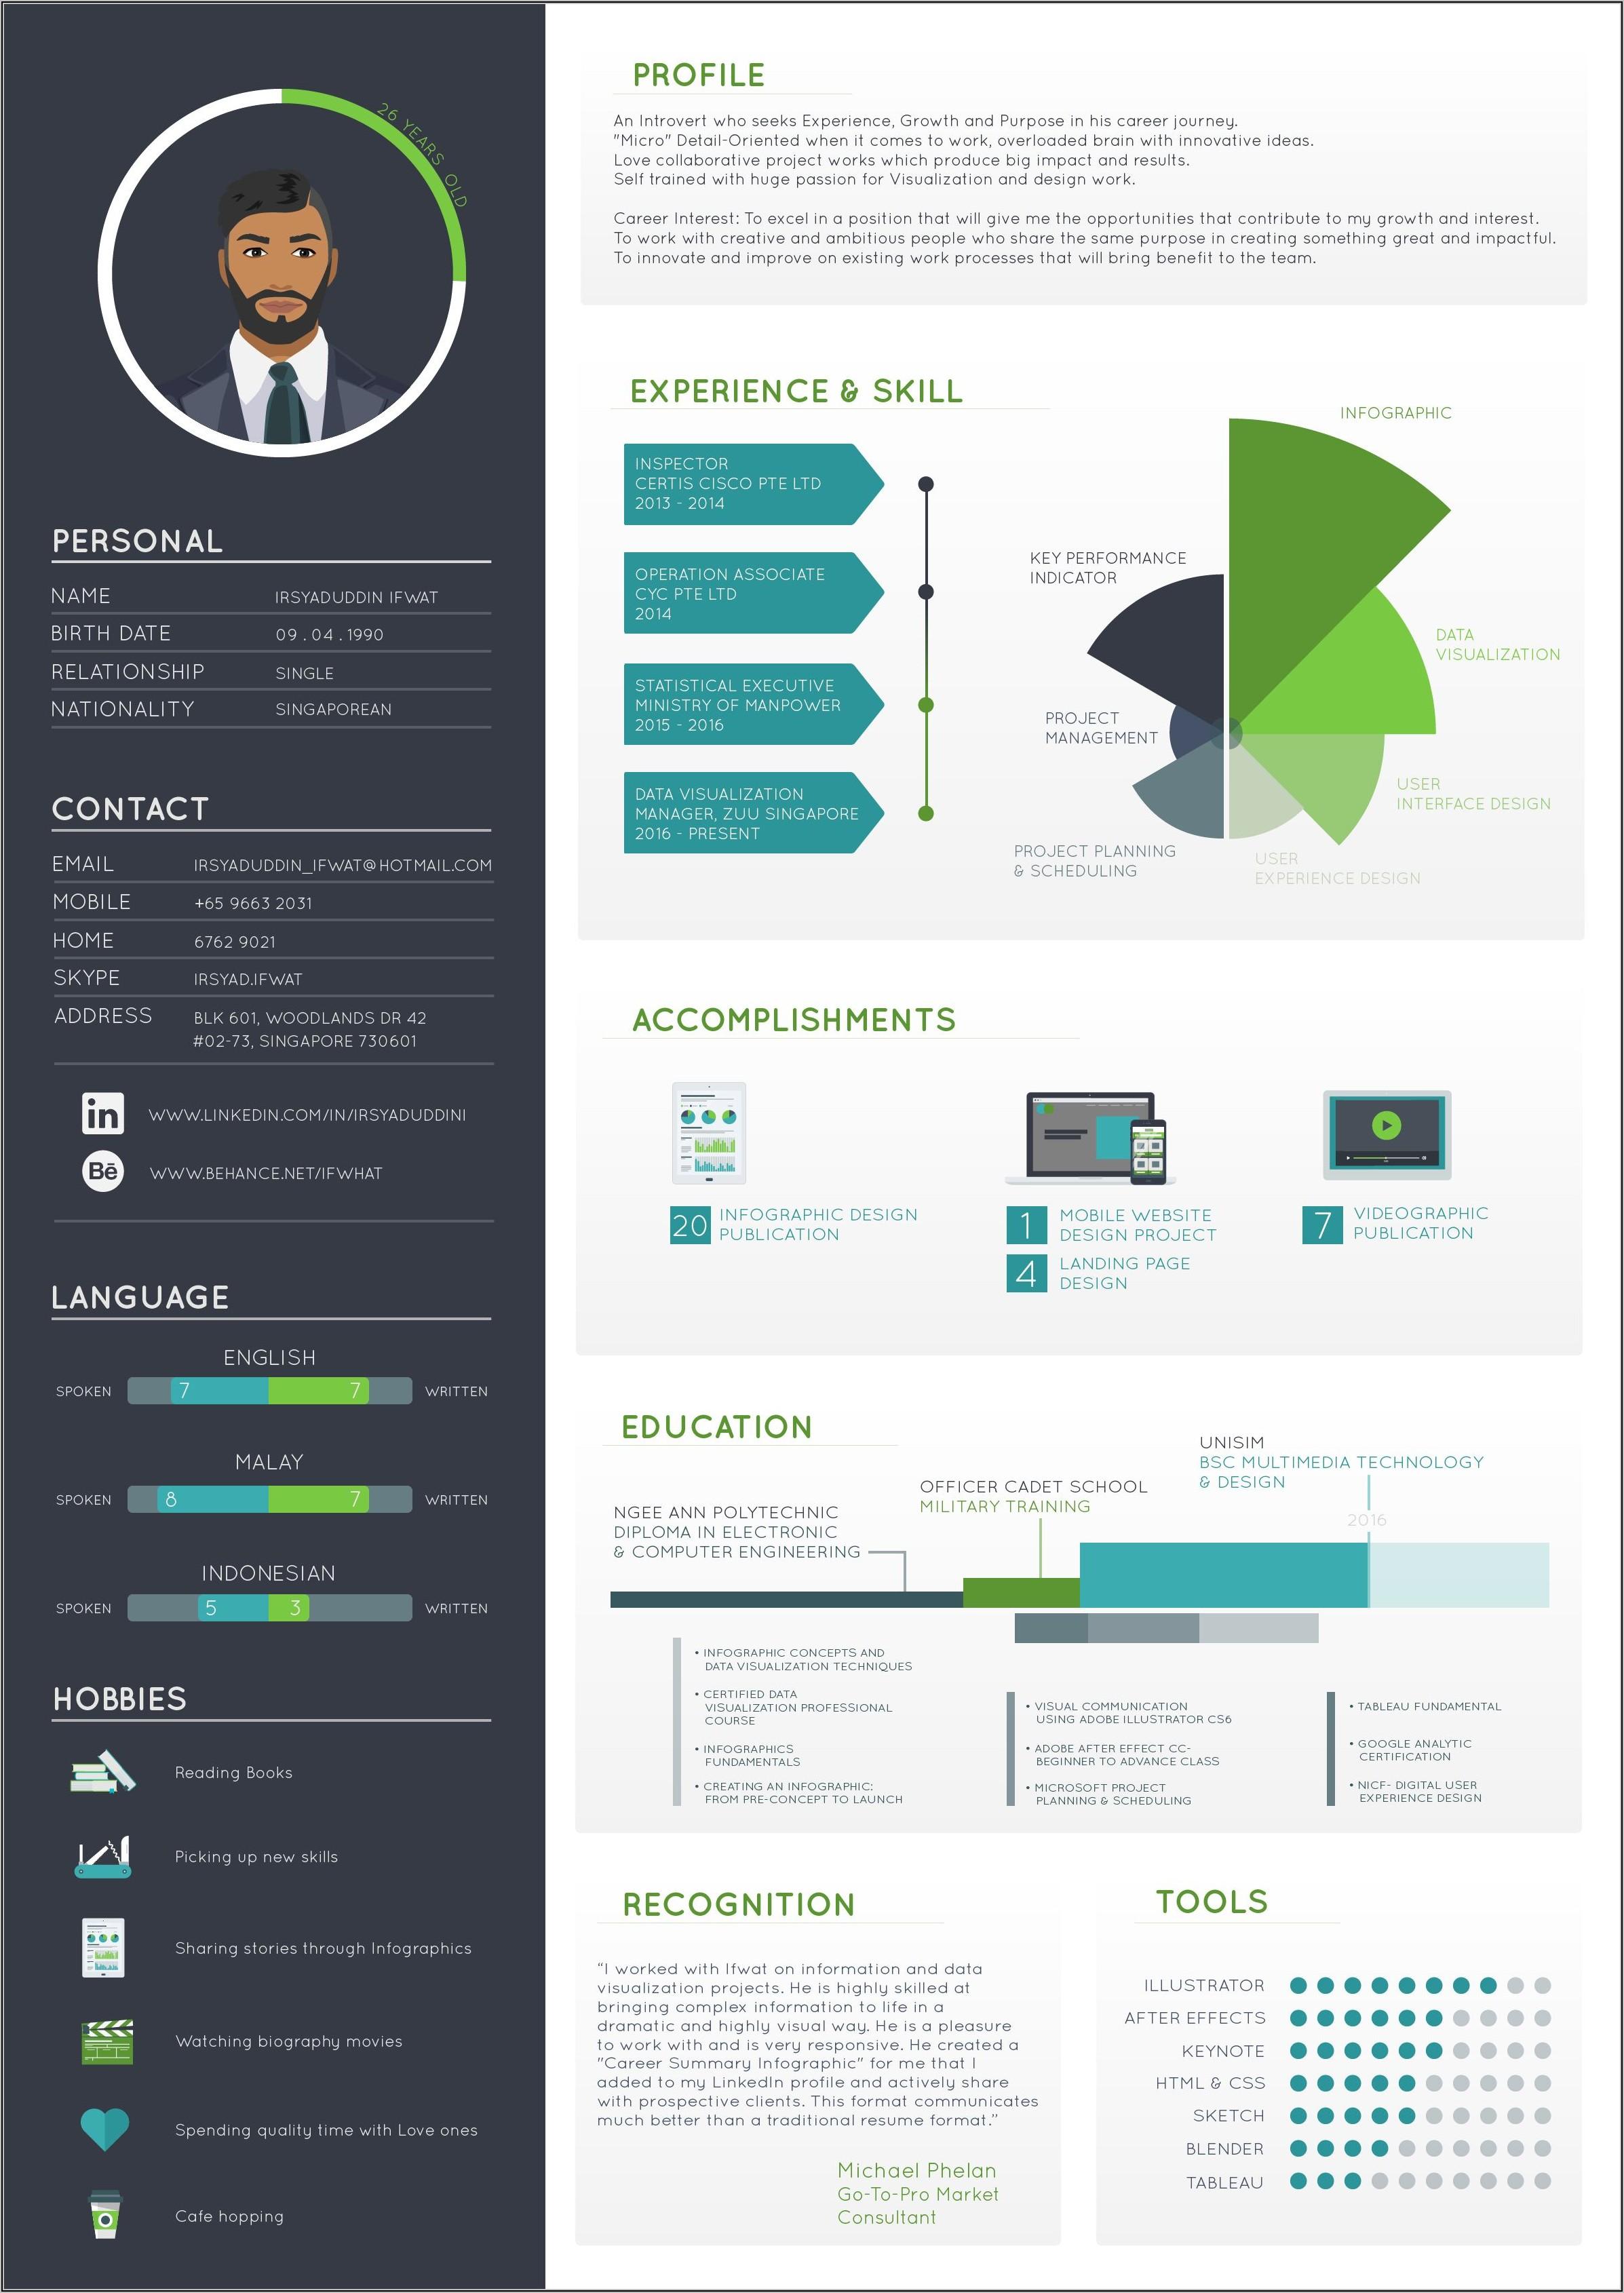 Buy Infographic Templates